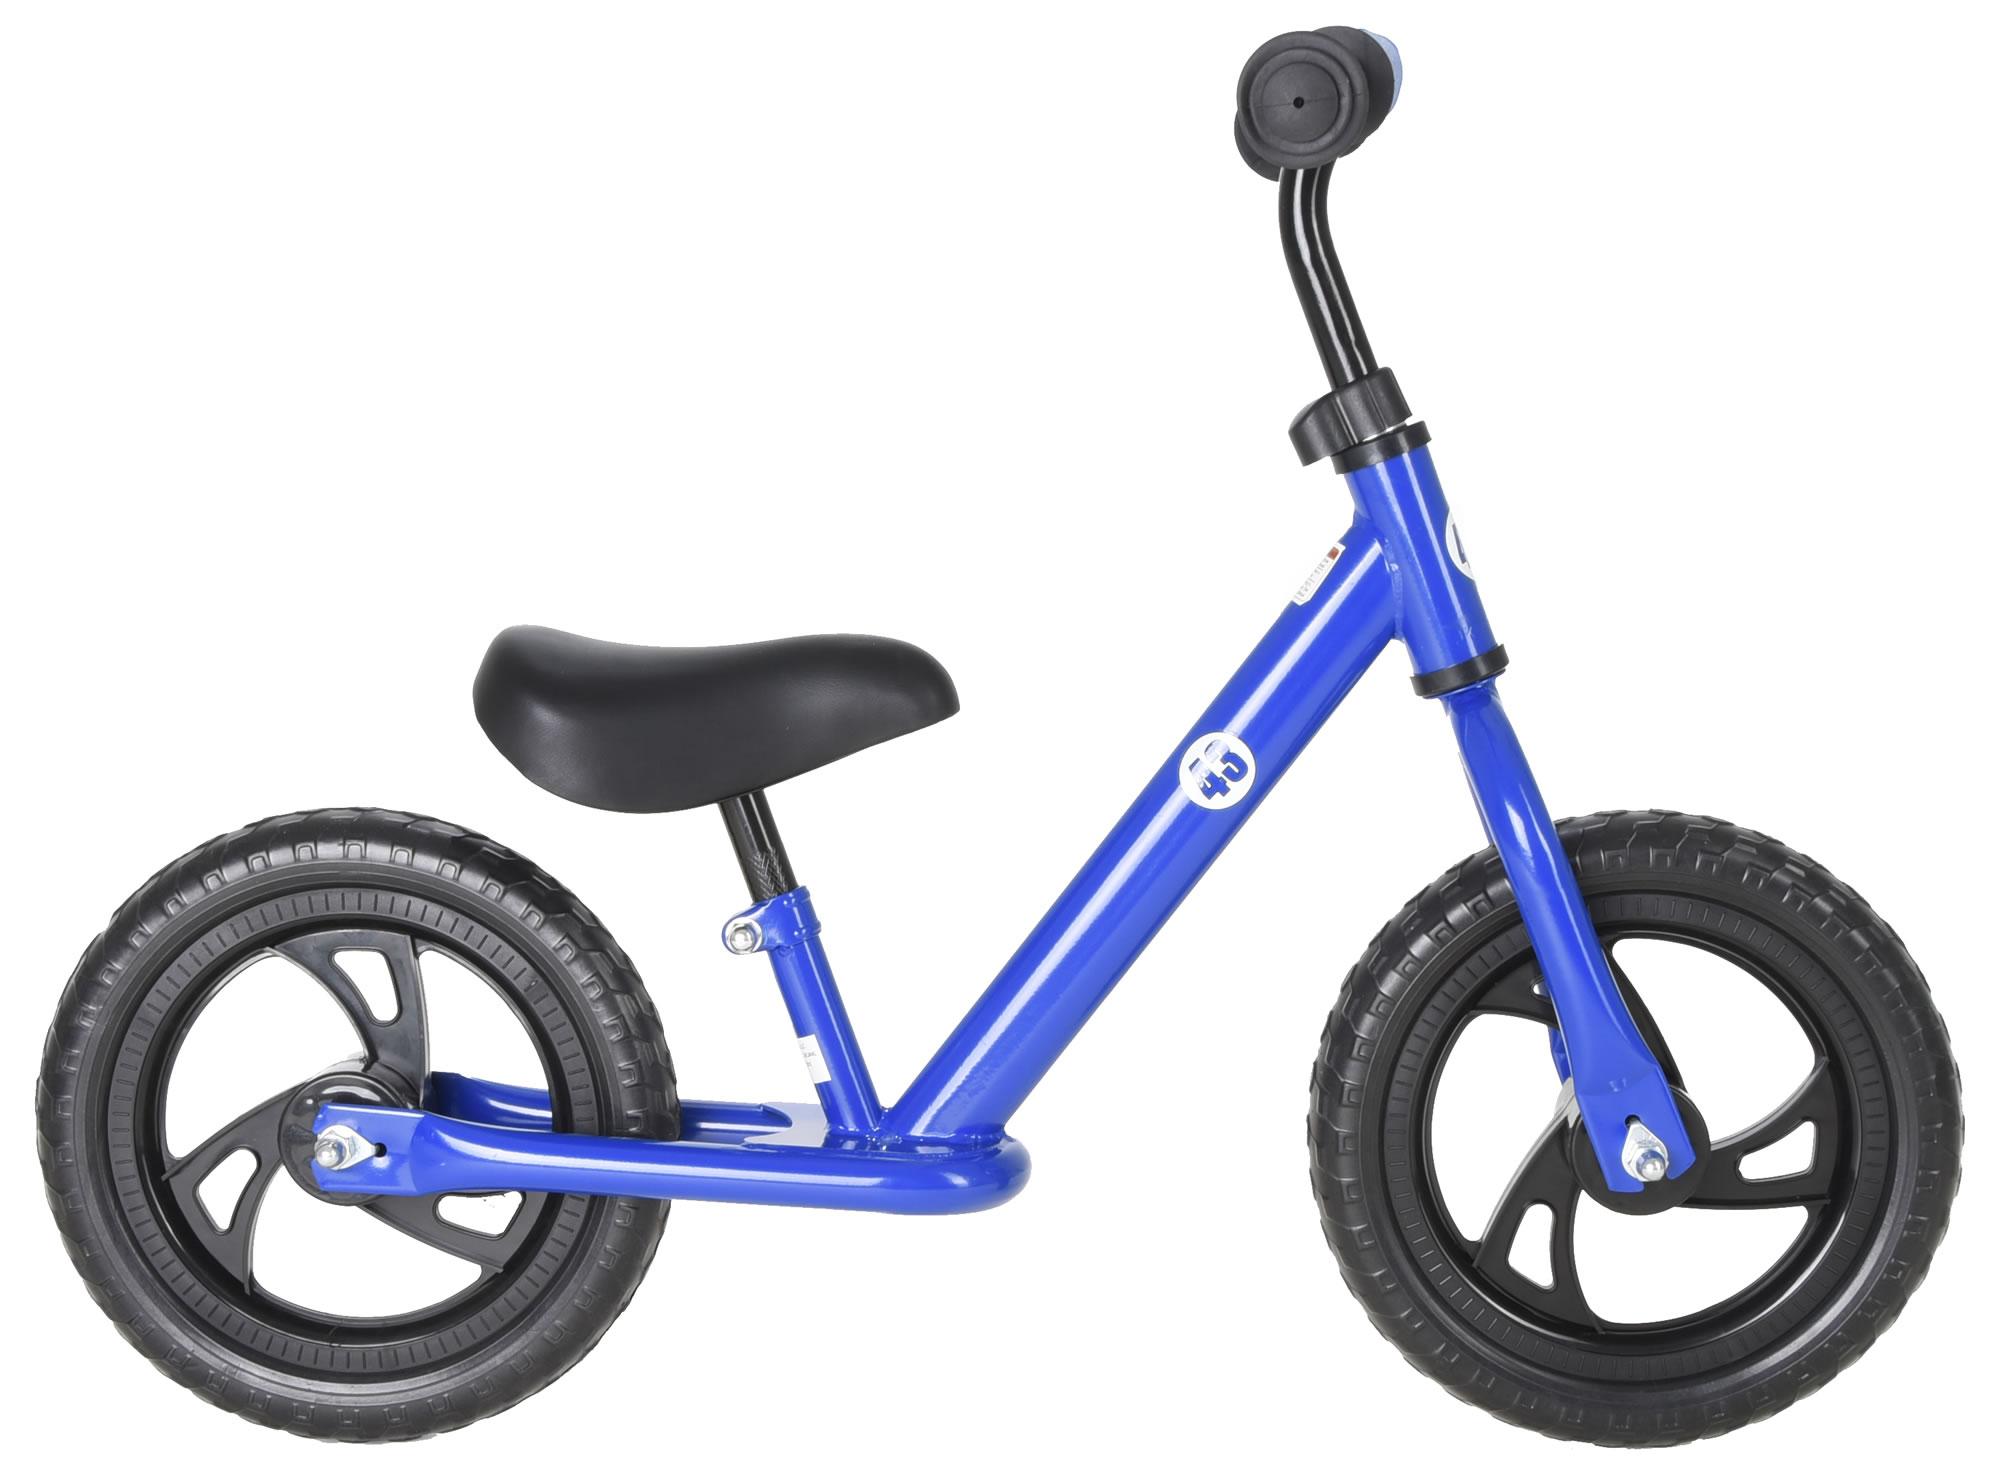 Vilano-Rally-Childrens-Balance-Bike-No-Pedal-Toddler-Push-Bicycle thumbnail 8